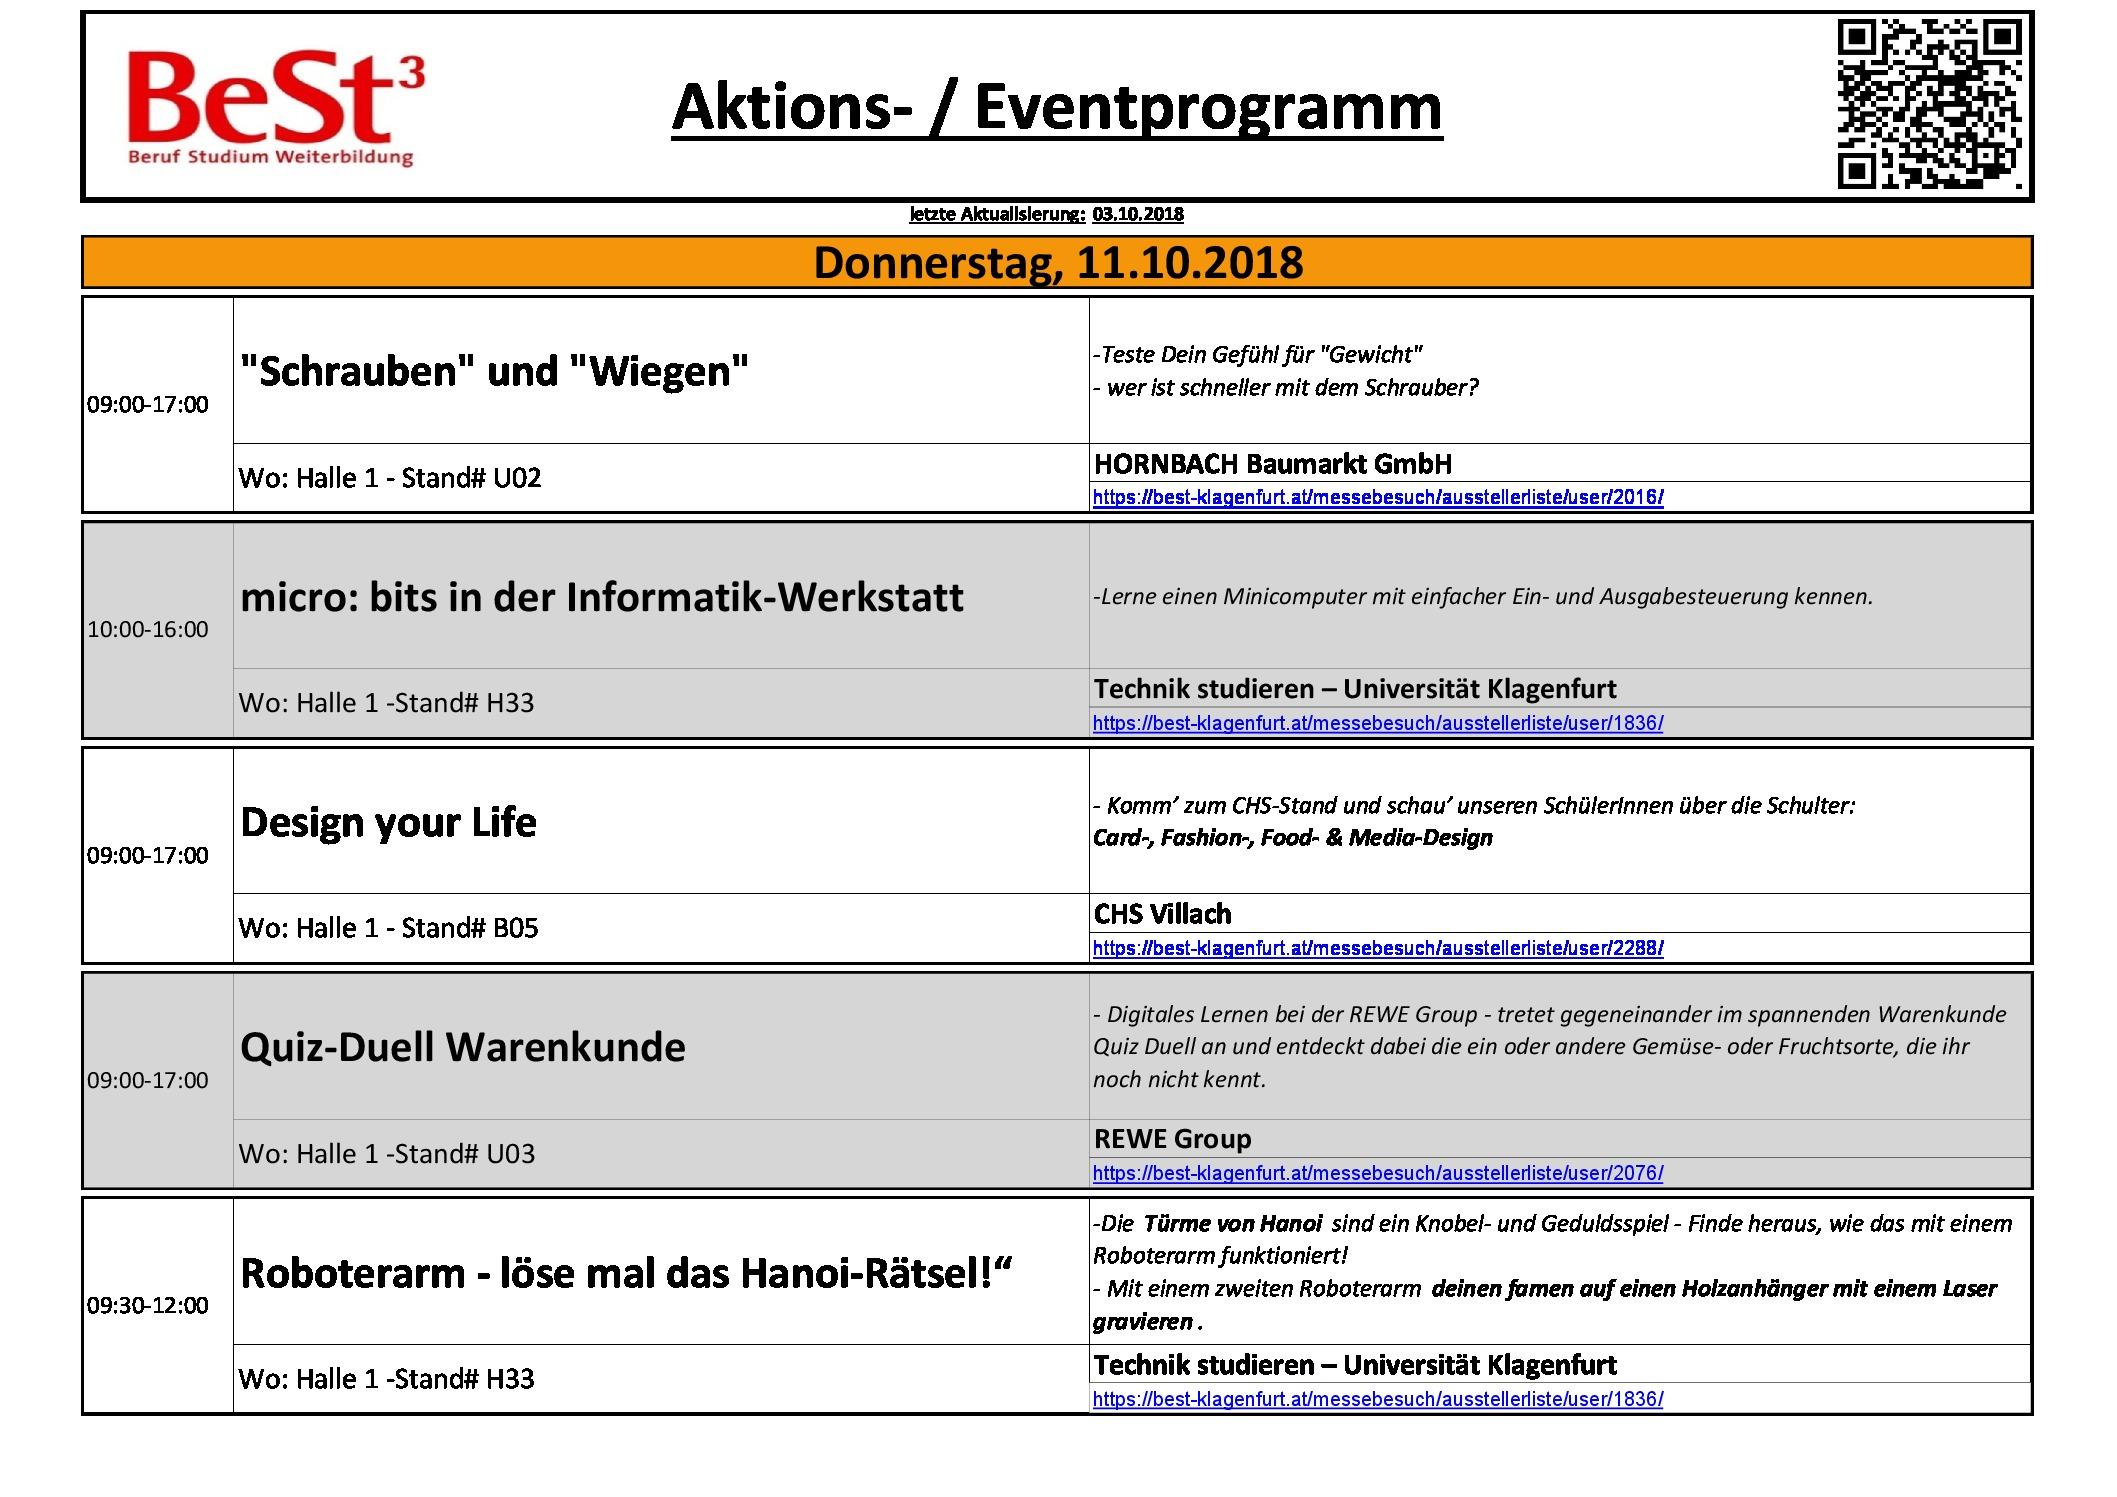 thumbnail of BeSt-Aktionsprogramm2018-04